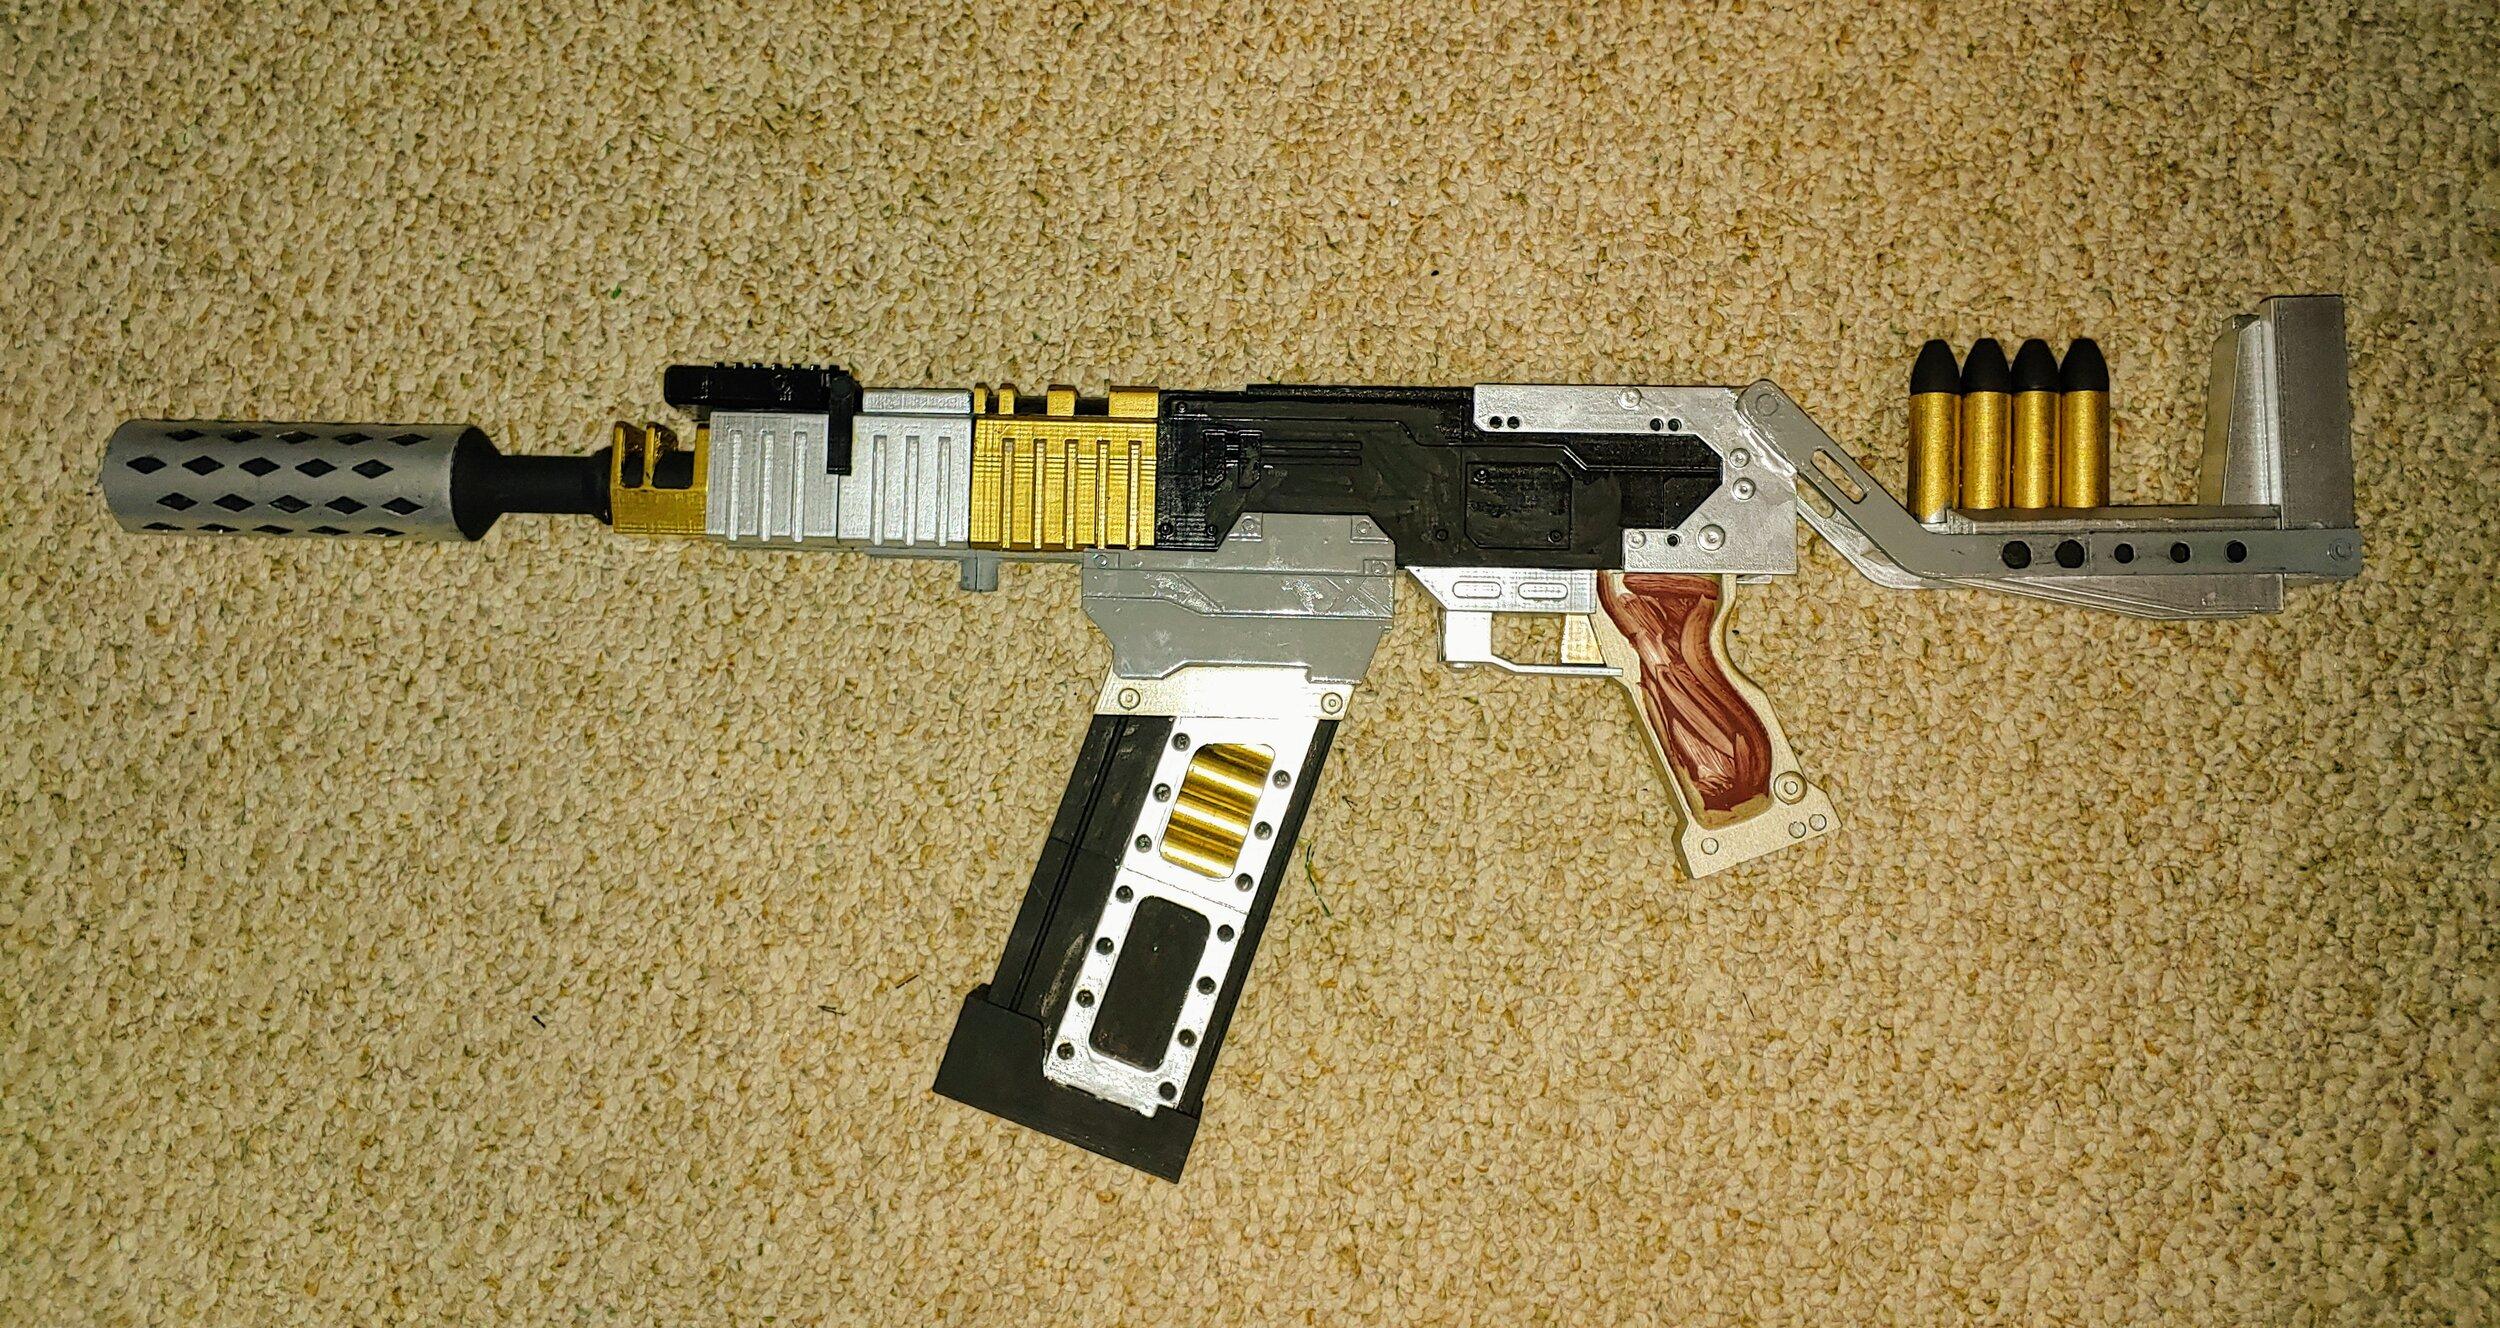 3D Printed Prop Gun from Firefly